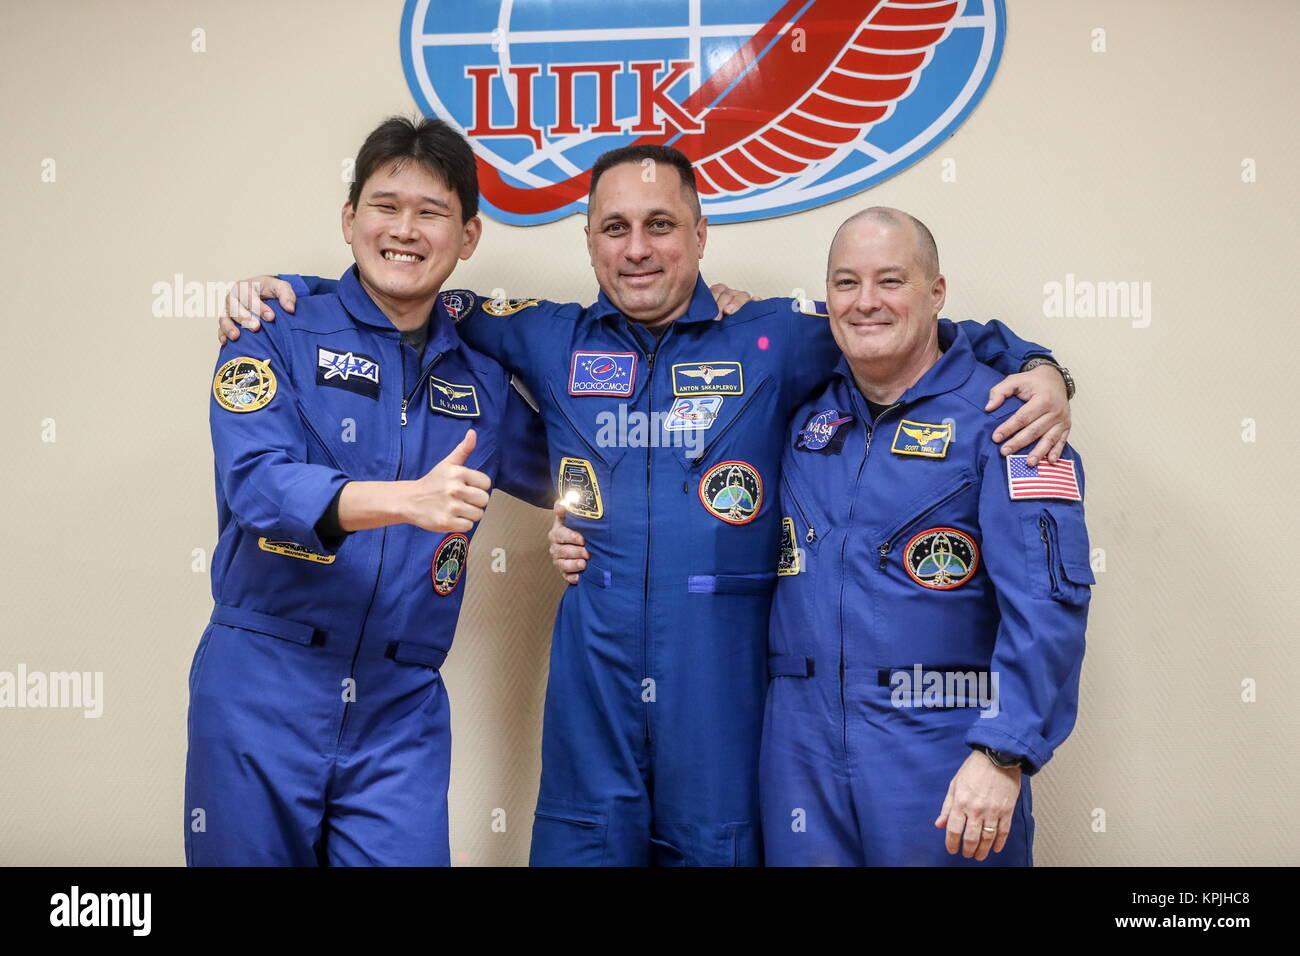 Baikonur, Kazakhstan. 16th Dec, 2017. ISS Expedition 54/55 prime crew members, Japanese astronaut Norishige Kanai Stock Photo